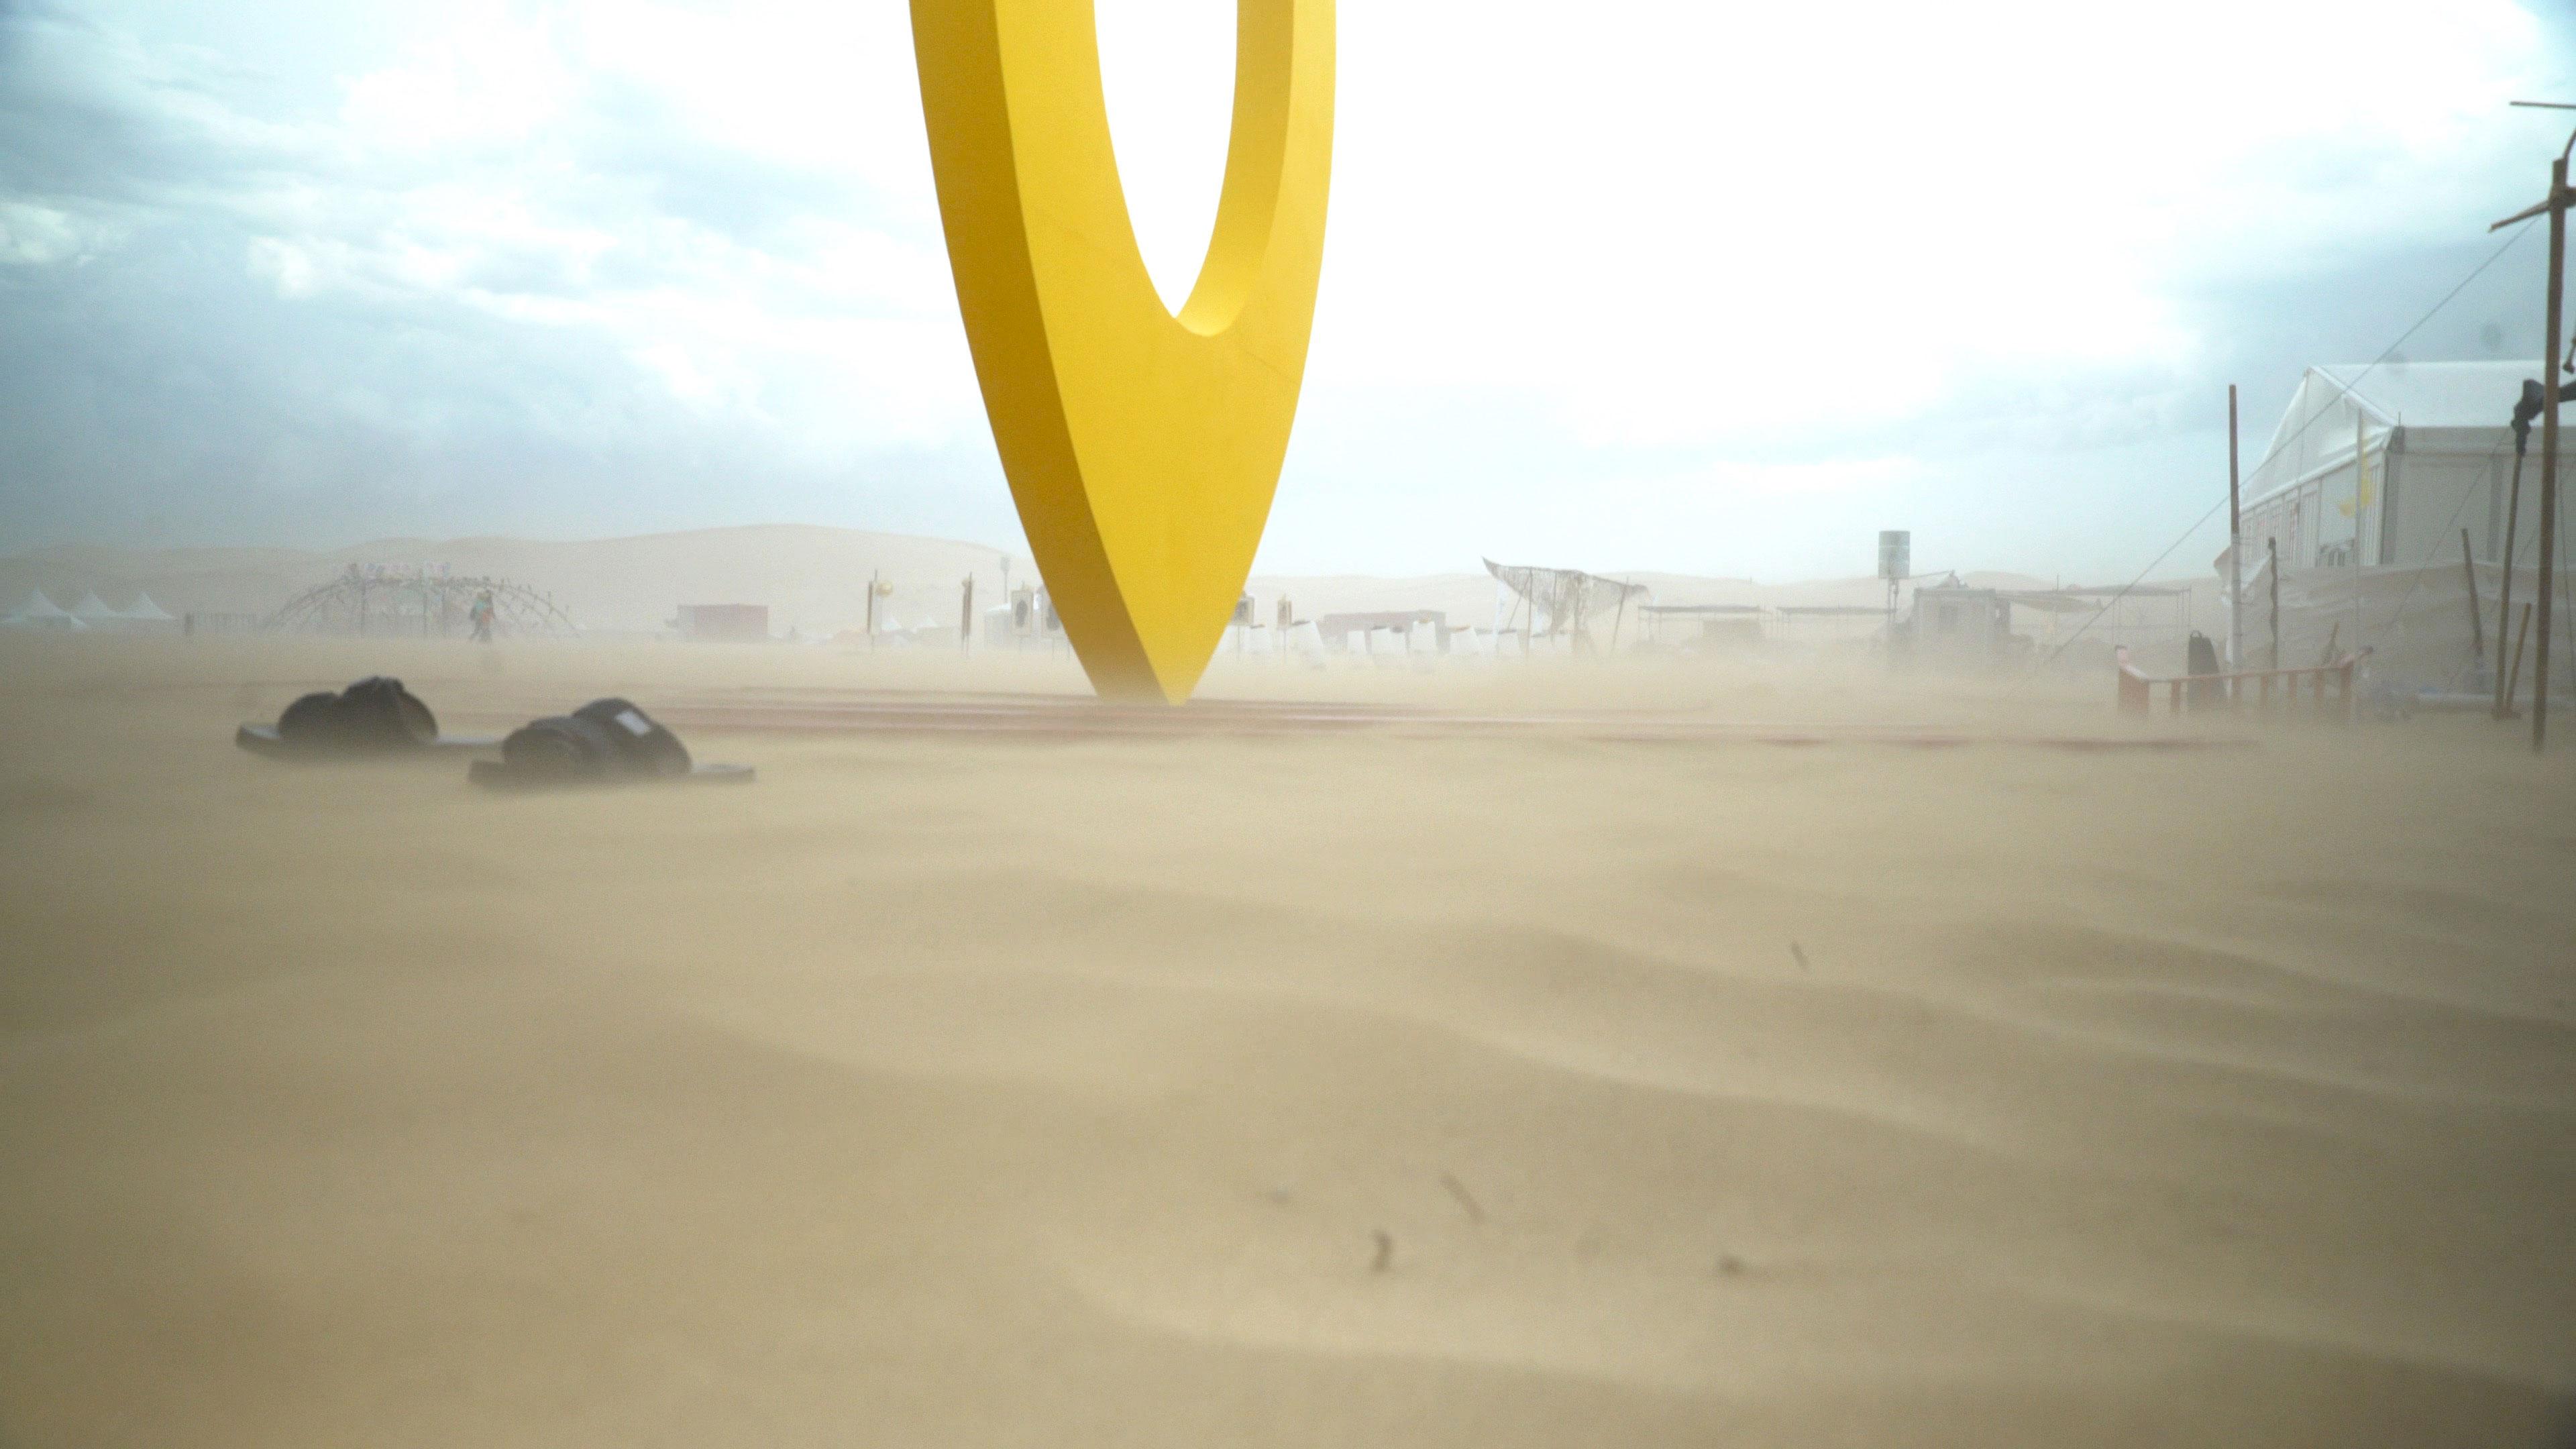 Sand storm at Gobi Heaven